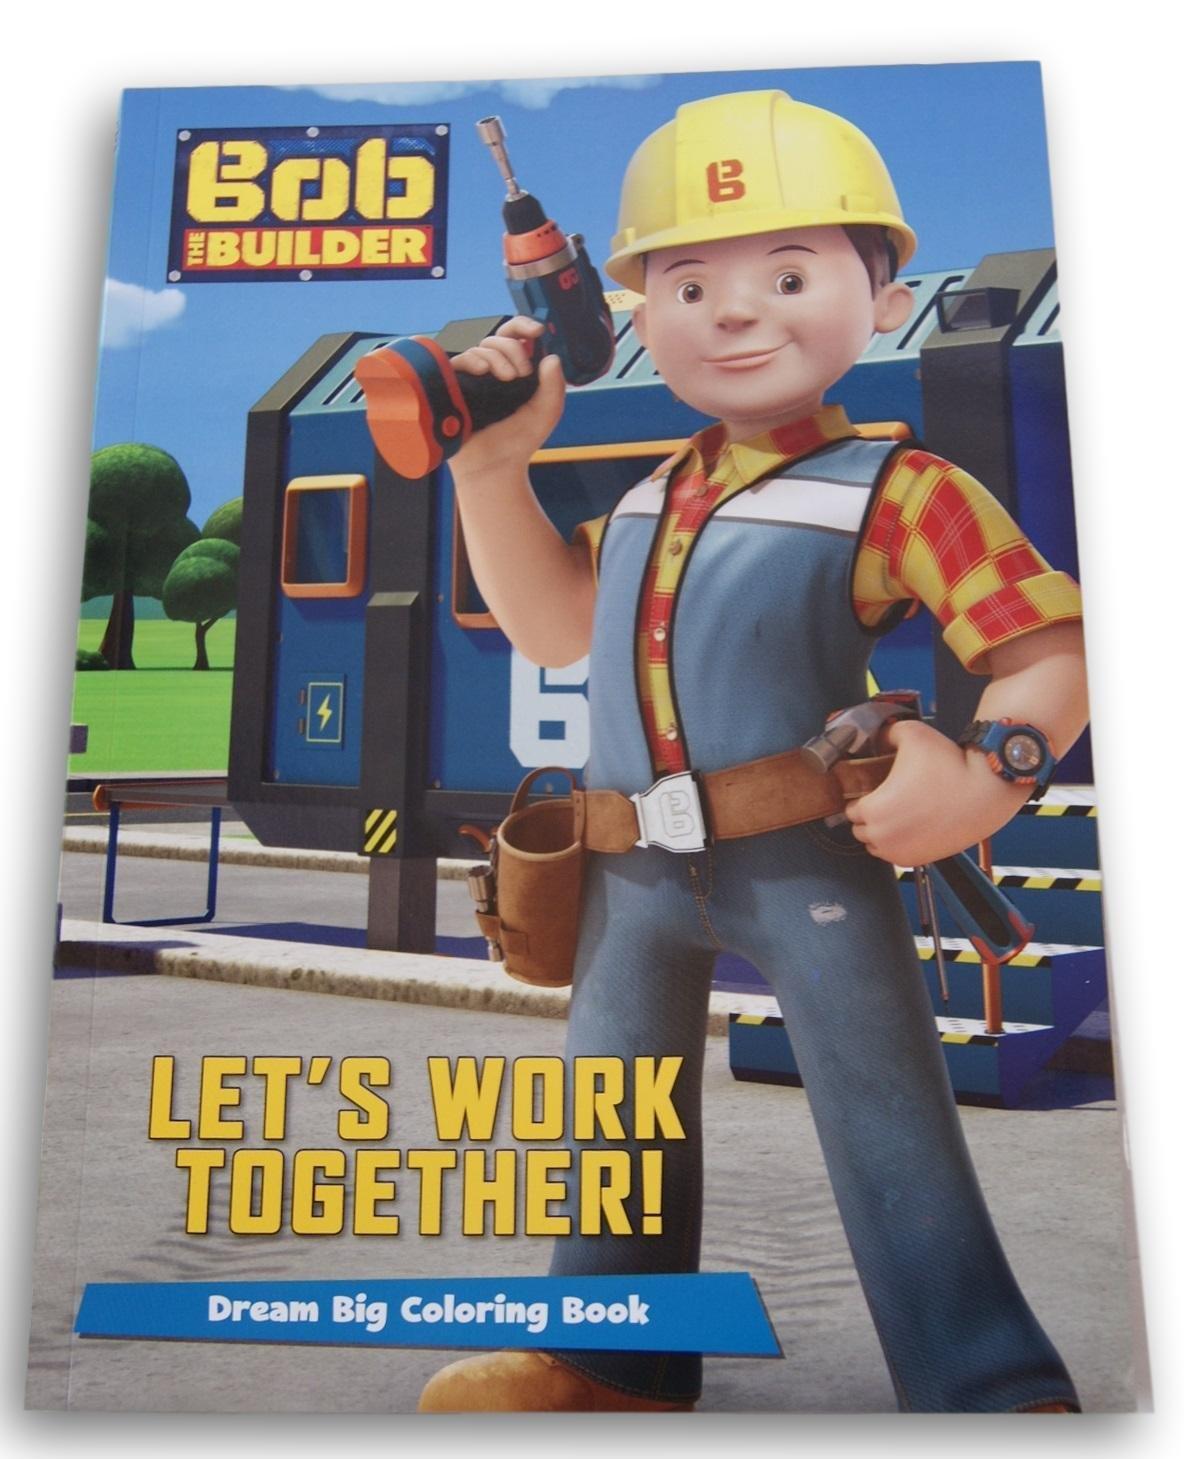 Coloring Book Parragon Inc Bob the Builder Lets Work Together